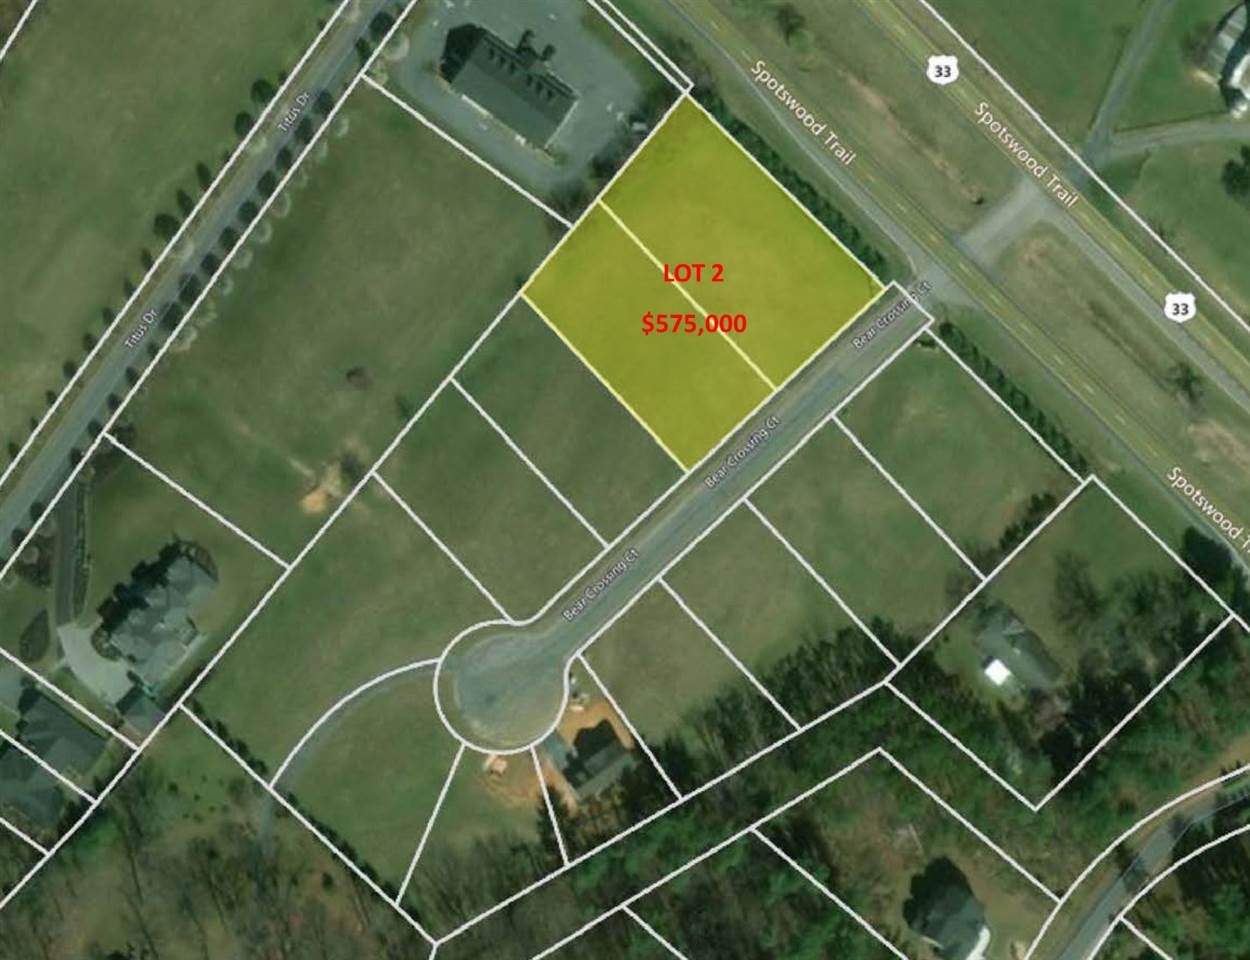 Lot 11-12 BEAR CROSSING CT, PENN LAIRD, VA 22846